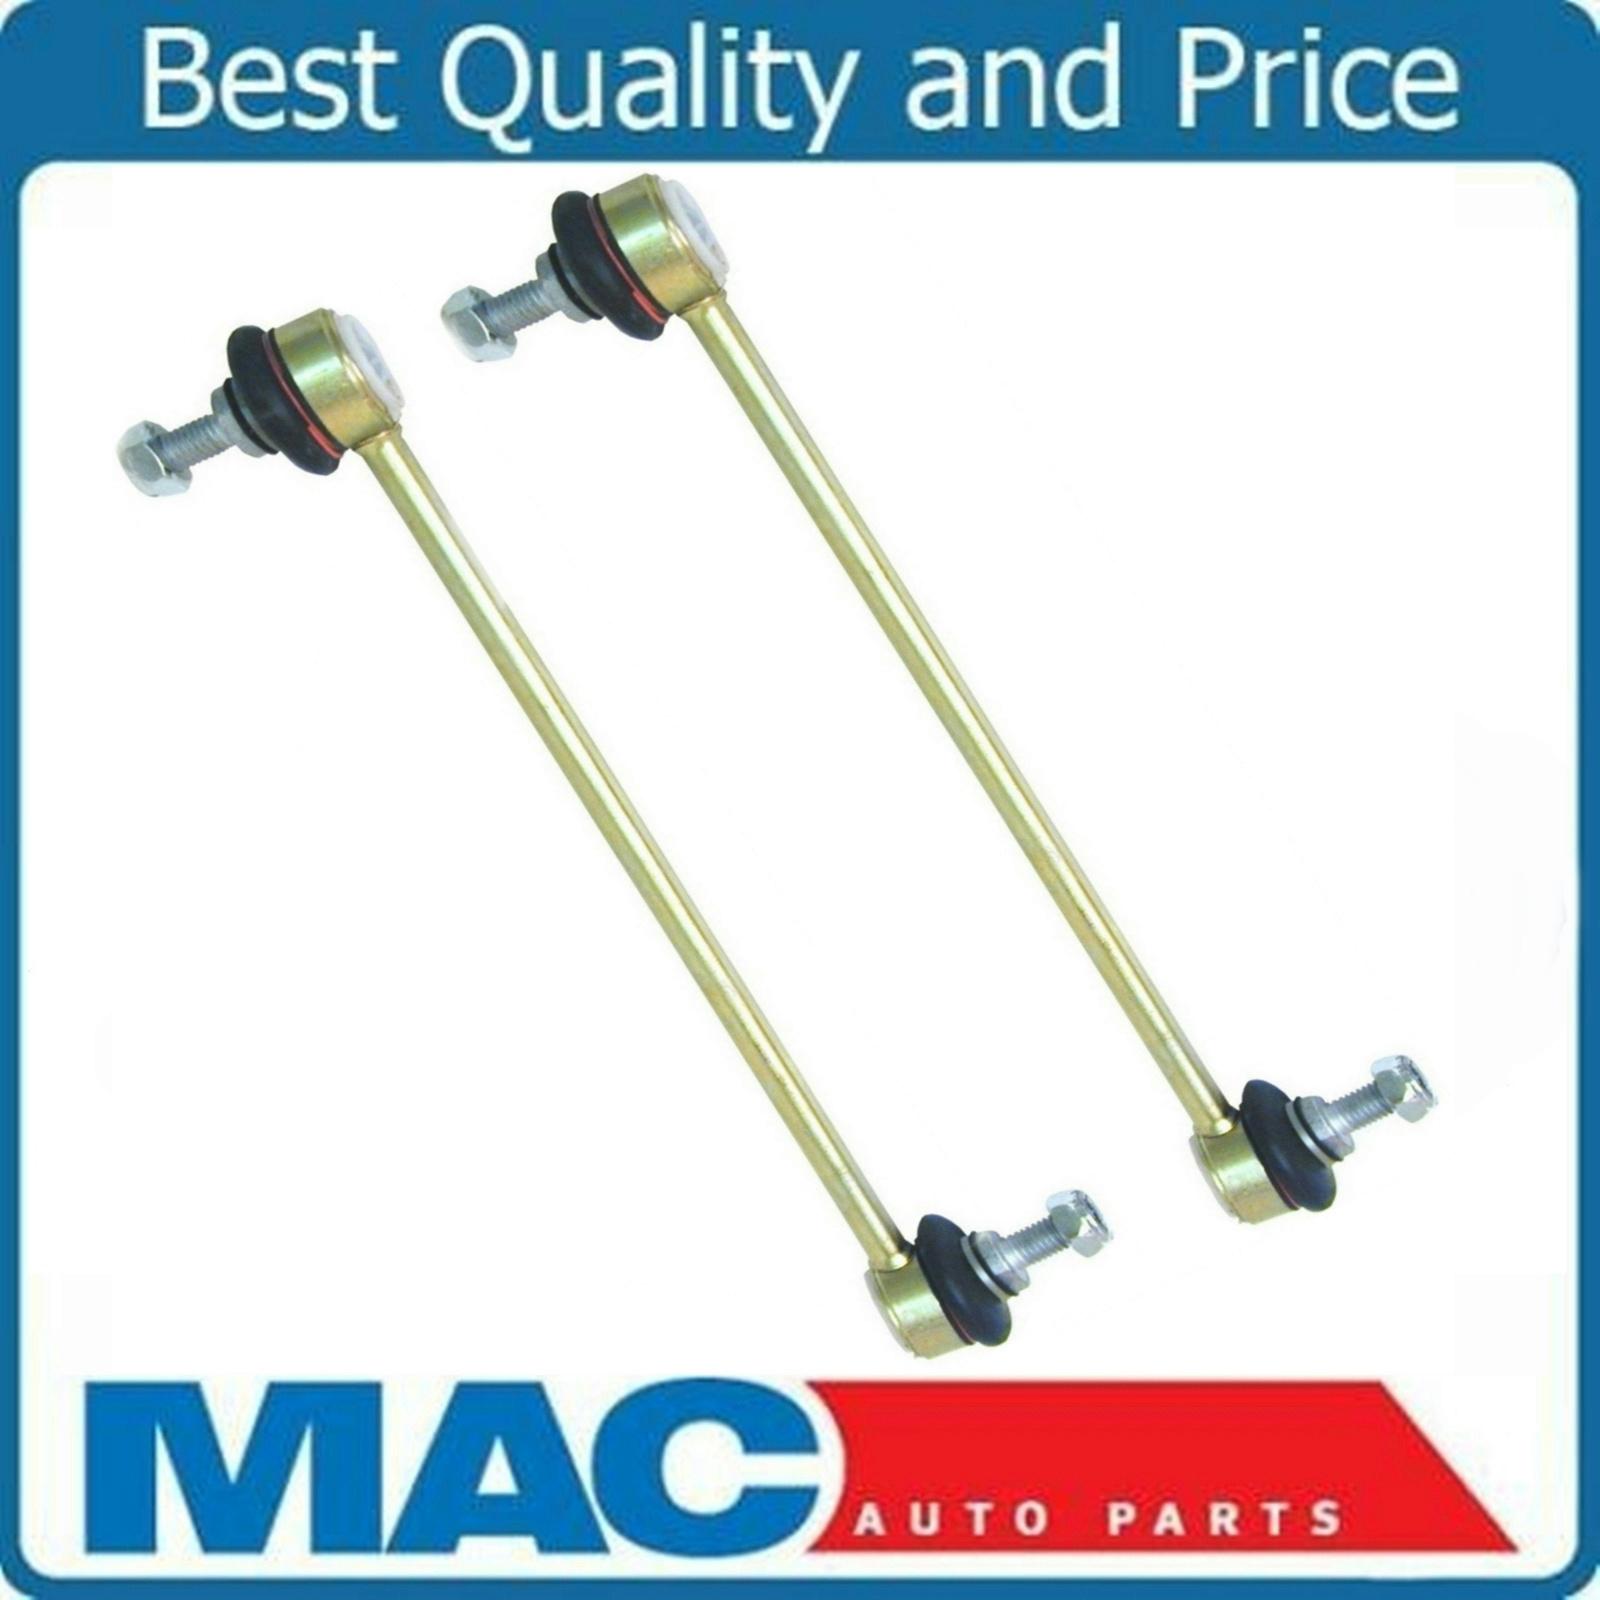 Mazda 3 5 Bmw 2 Front K80235 Suspension Stabilizer Bar Link 2007 Honda Crv Resonator Chamber Components Parts Diagram Car Kit